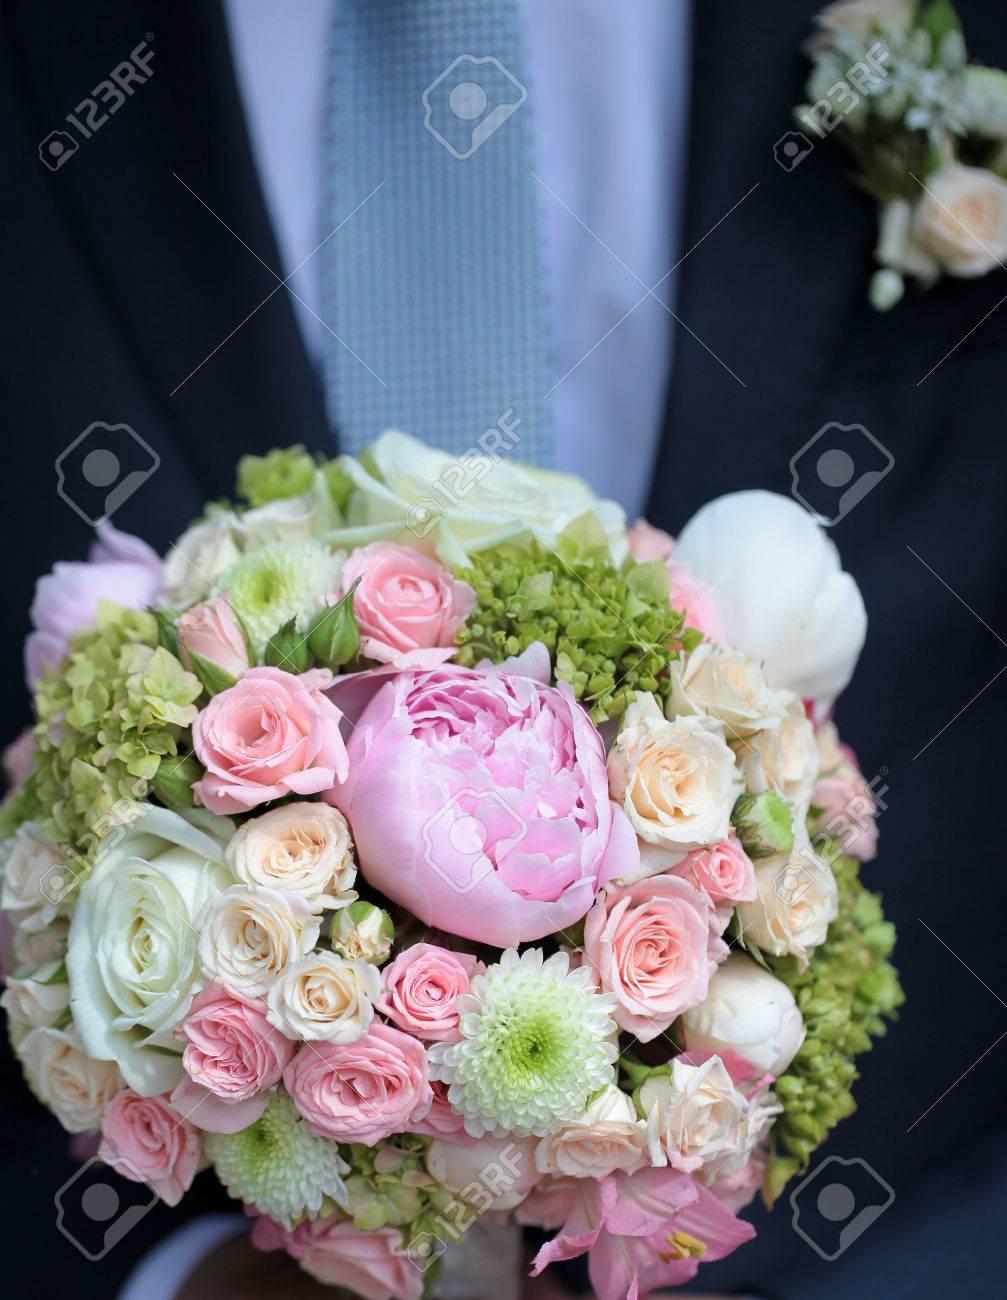 Bridegroom holding beautiful fresh wedding bouquet of pink lilac bridegroom holding beautiful fresh wedding bouquet of pink lilac purple white and violet chrysanthemum rose and mightylinksfo